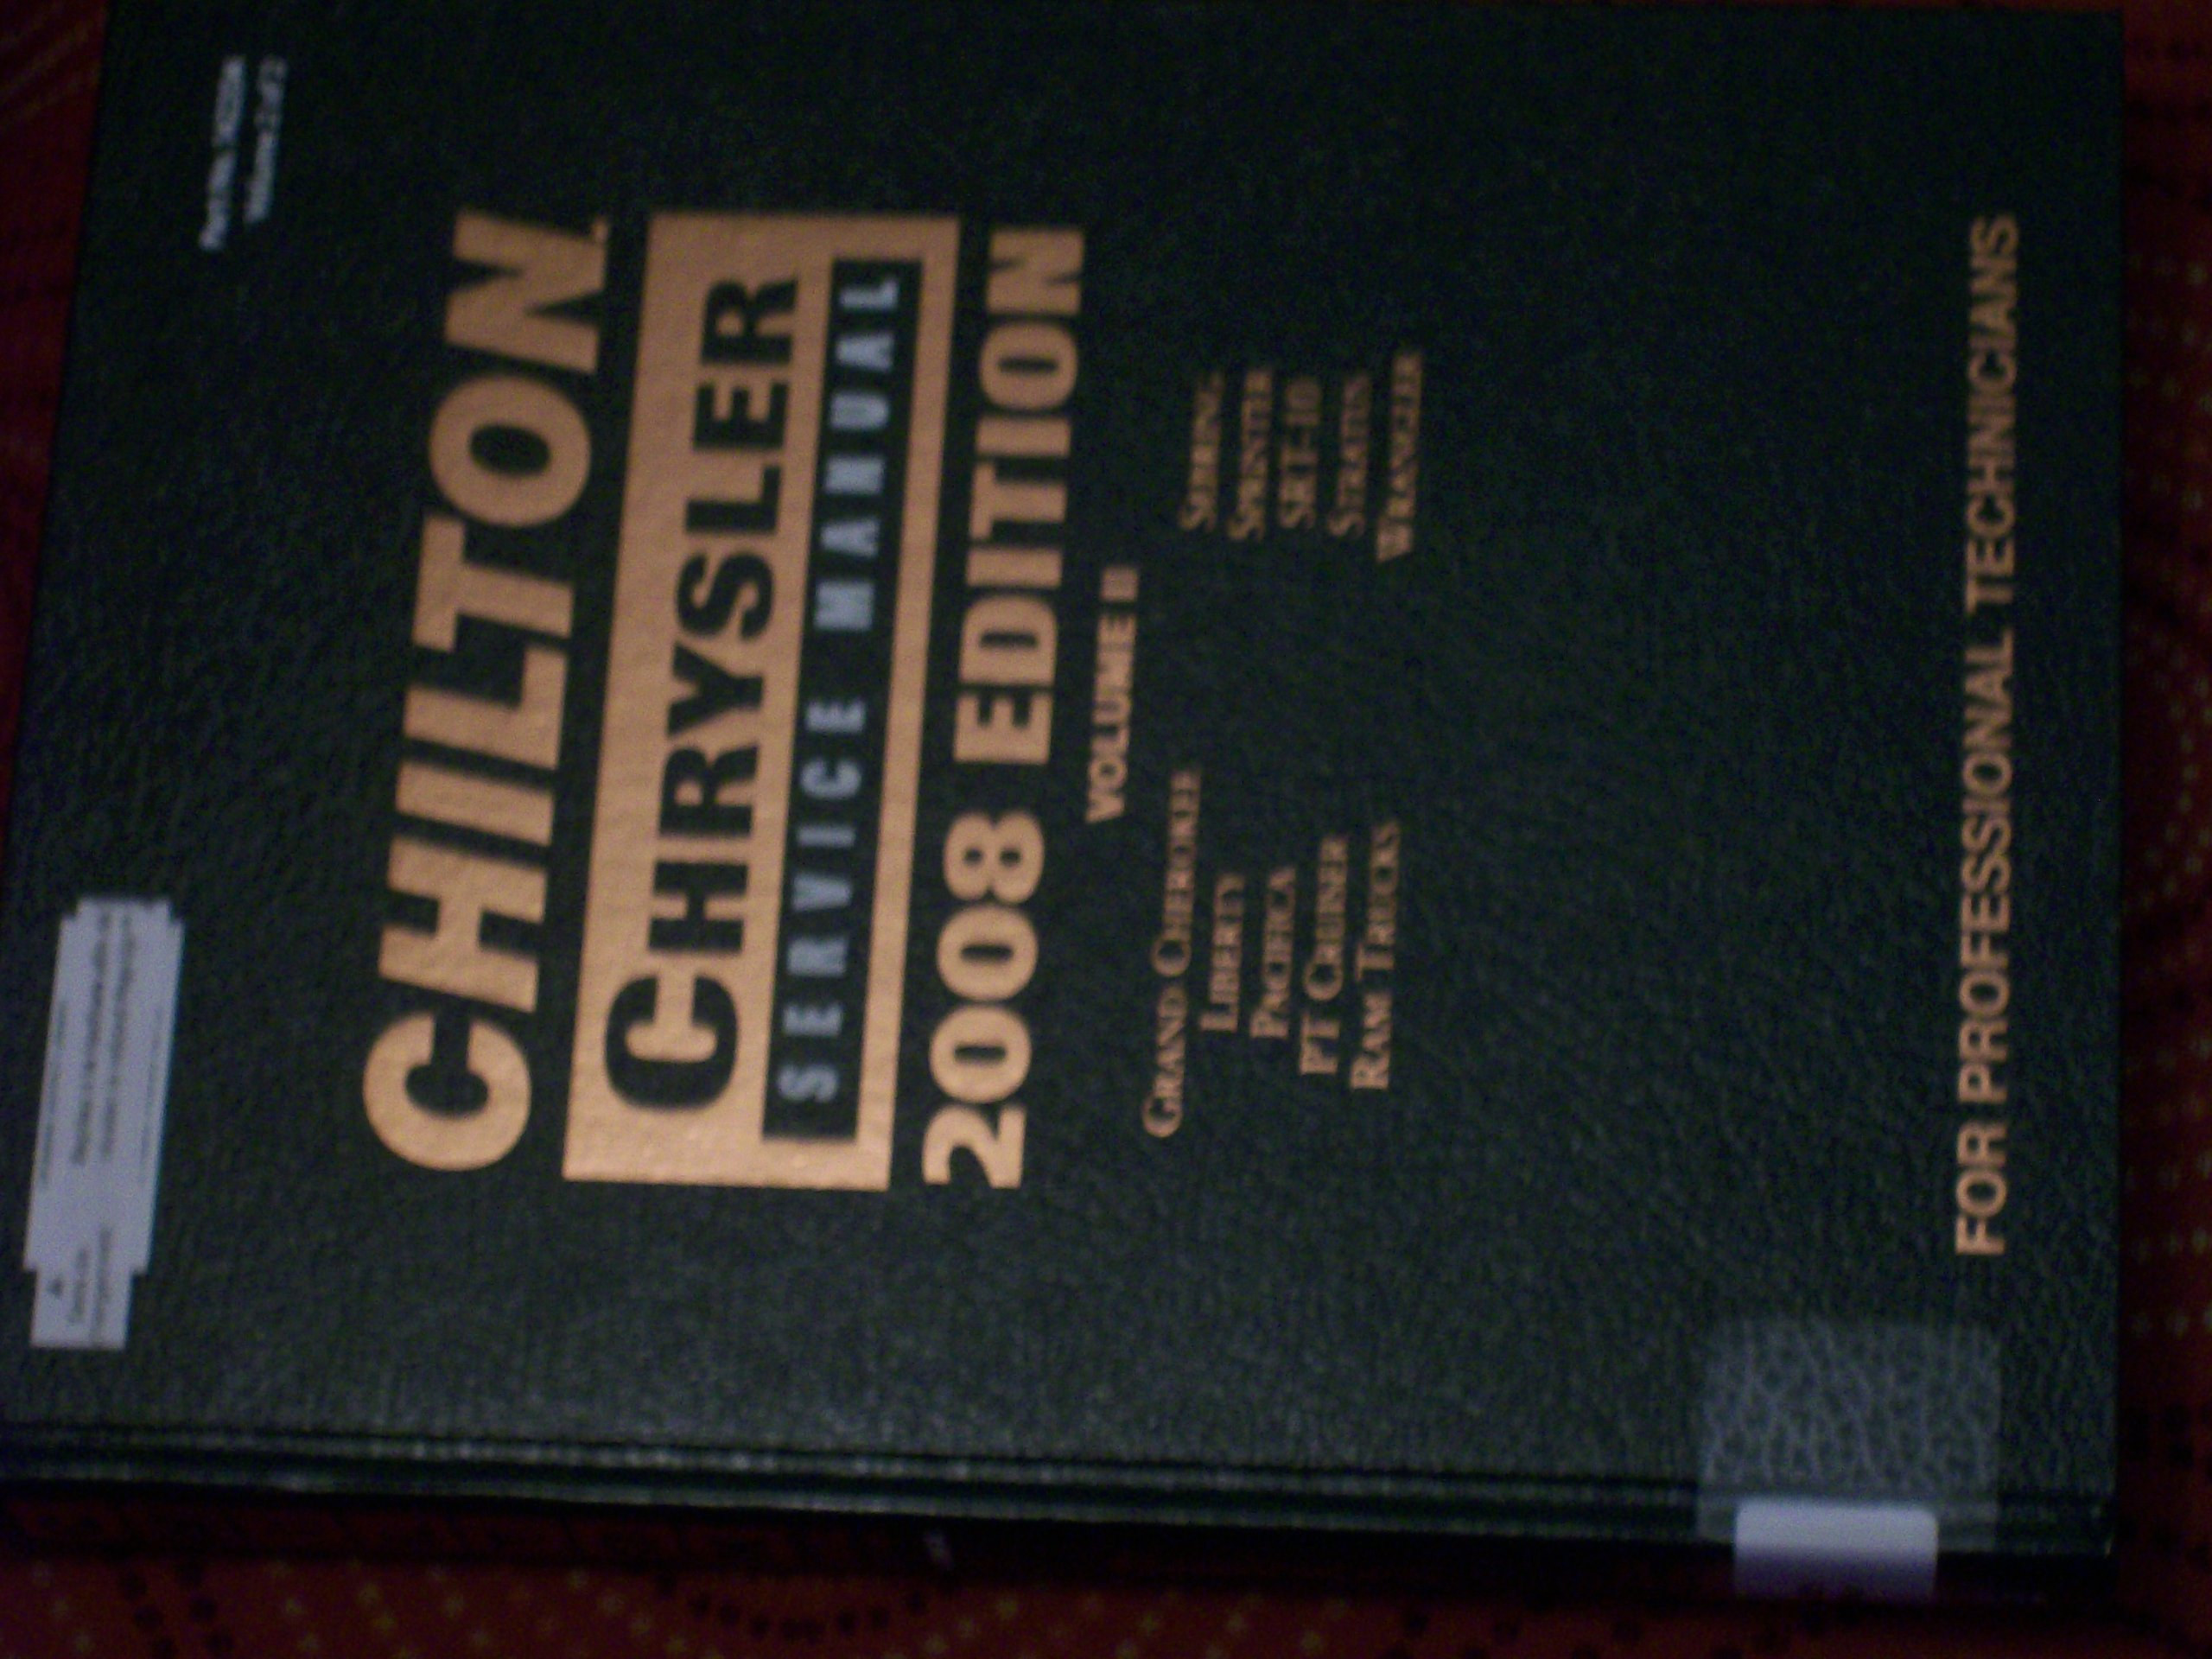 Chilton Chrysler Service Manual, Vol. 2: Nick D'Andrea: 9781428322073:  Amazon.com: Books